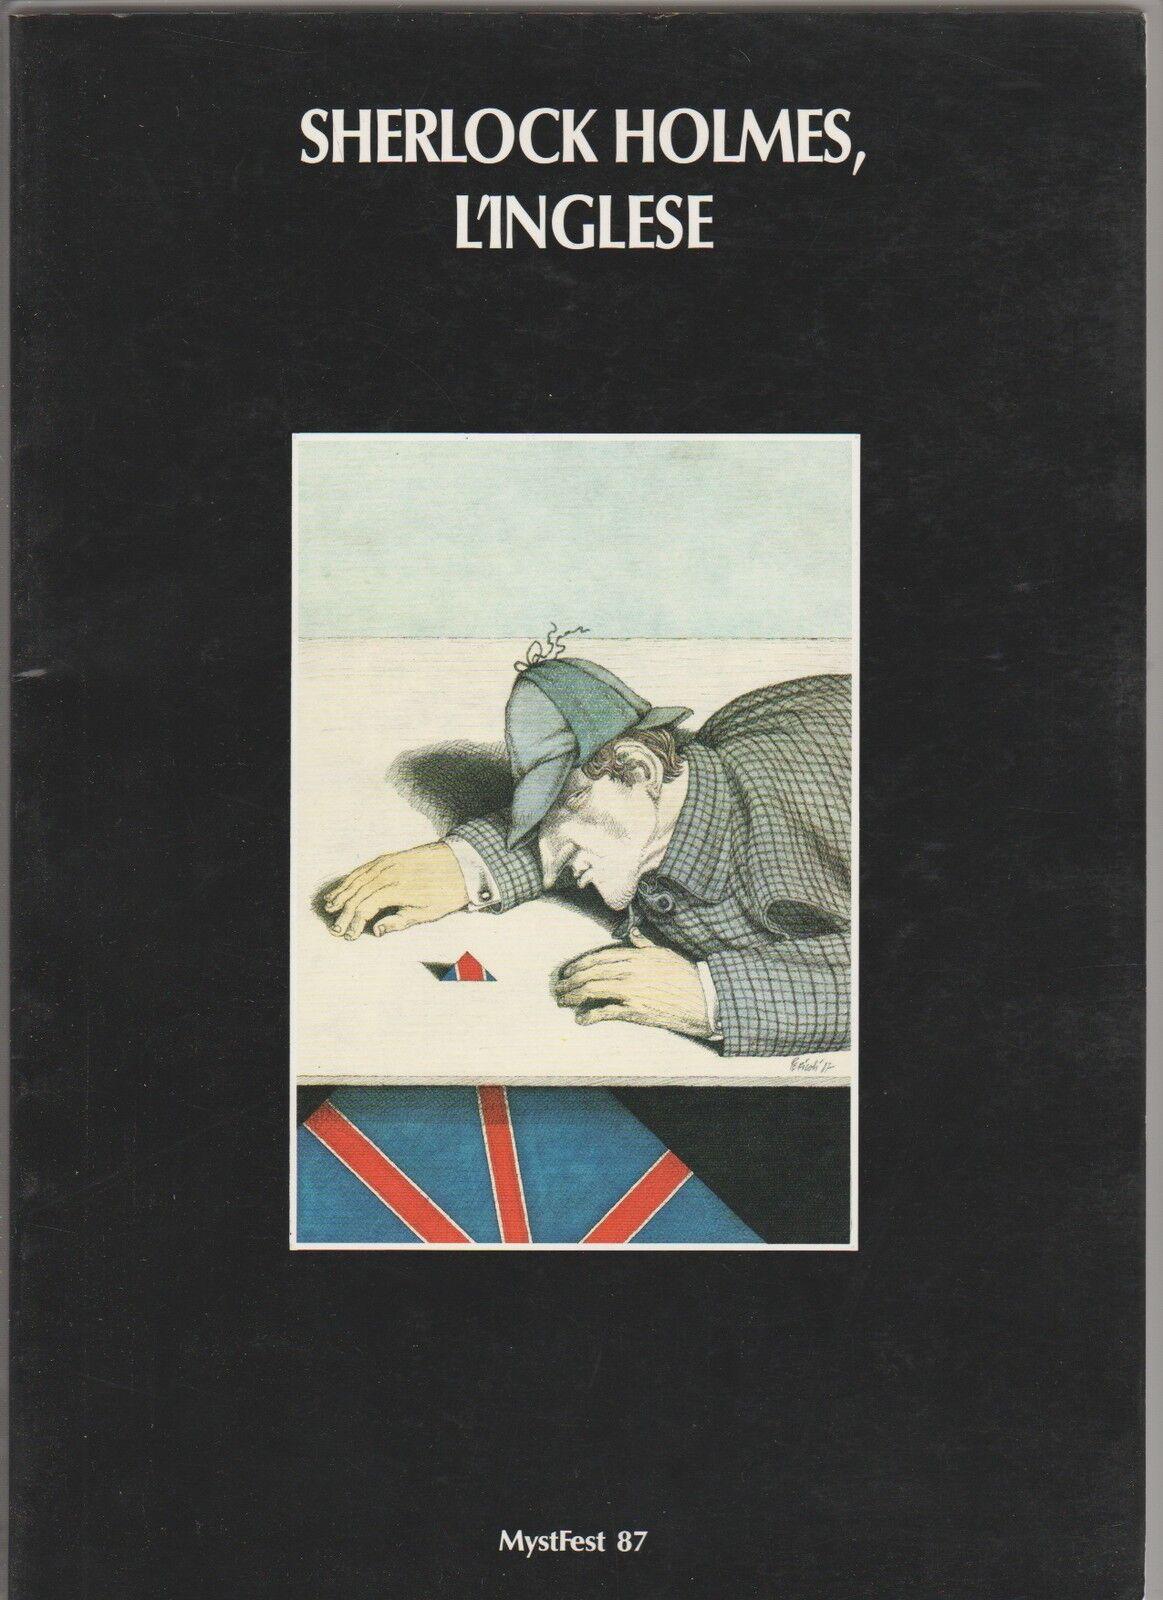 Sherlock Holmes, l'inglese - MyFest 87